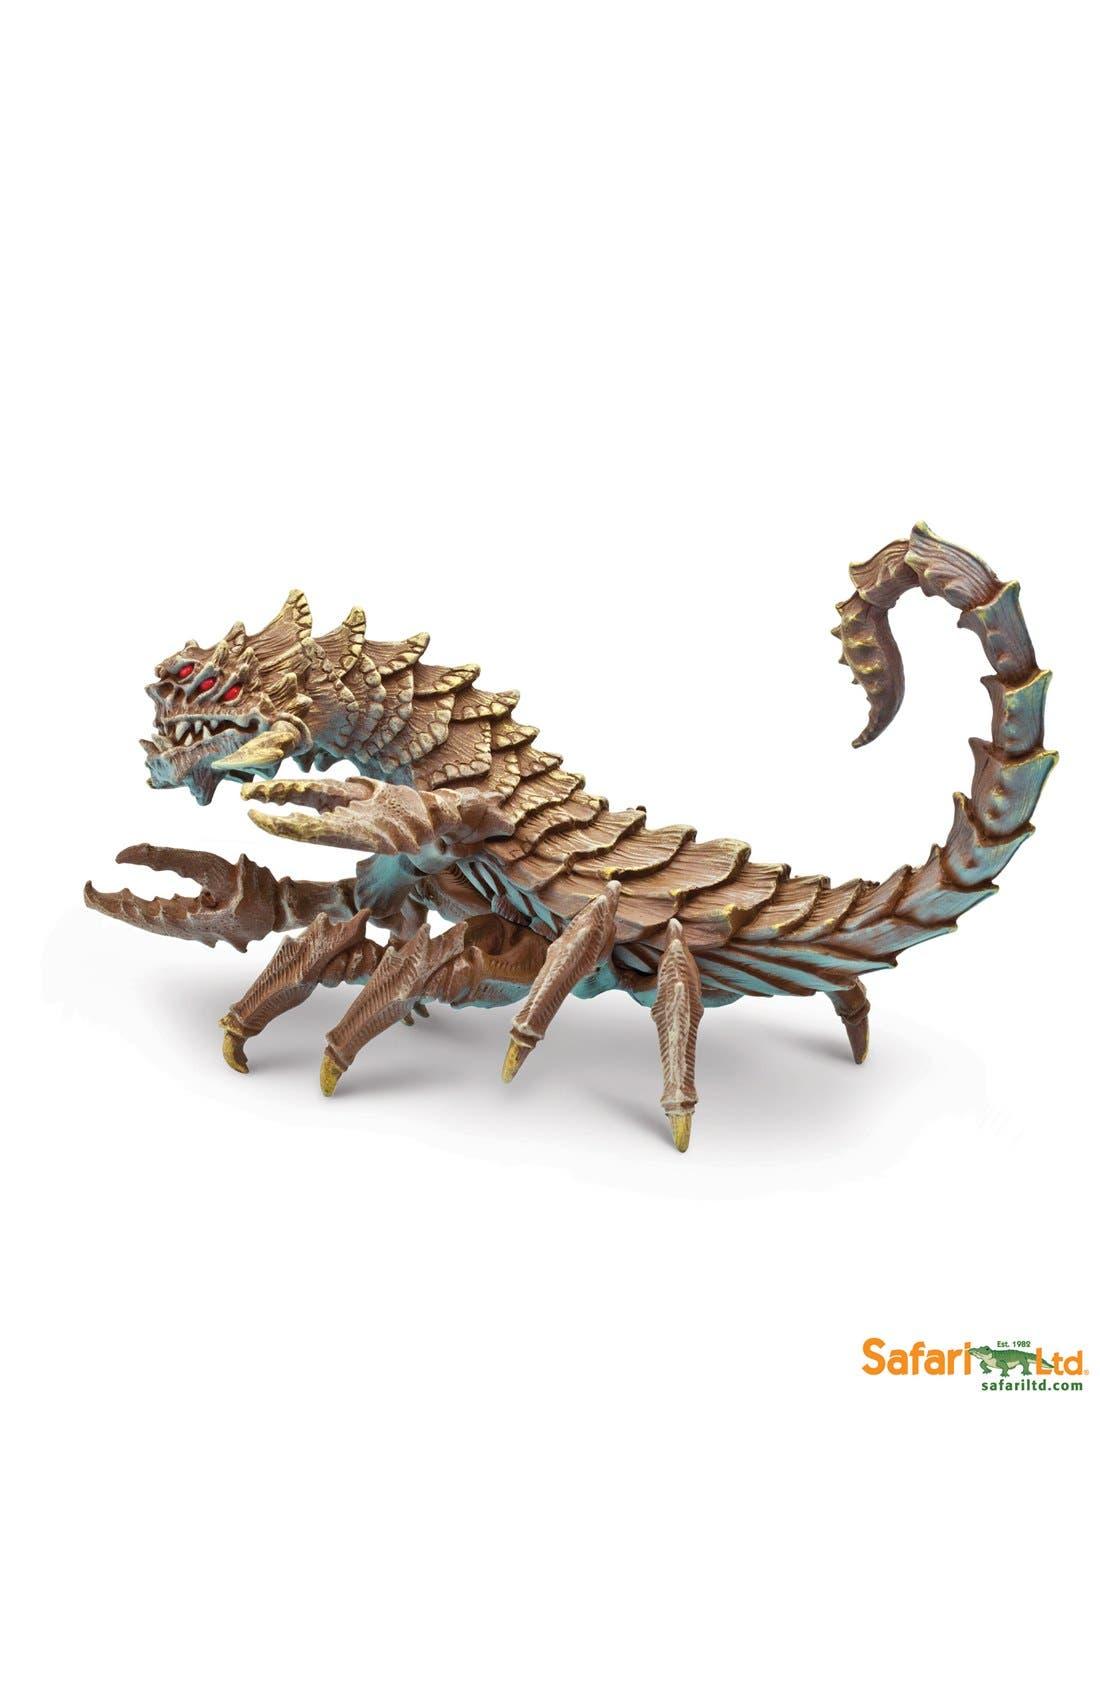 Alternate Image 1 Selected - Safari Ltd. Desert Dragon Figurine